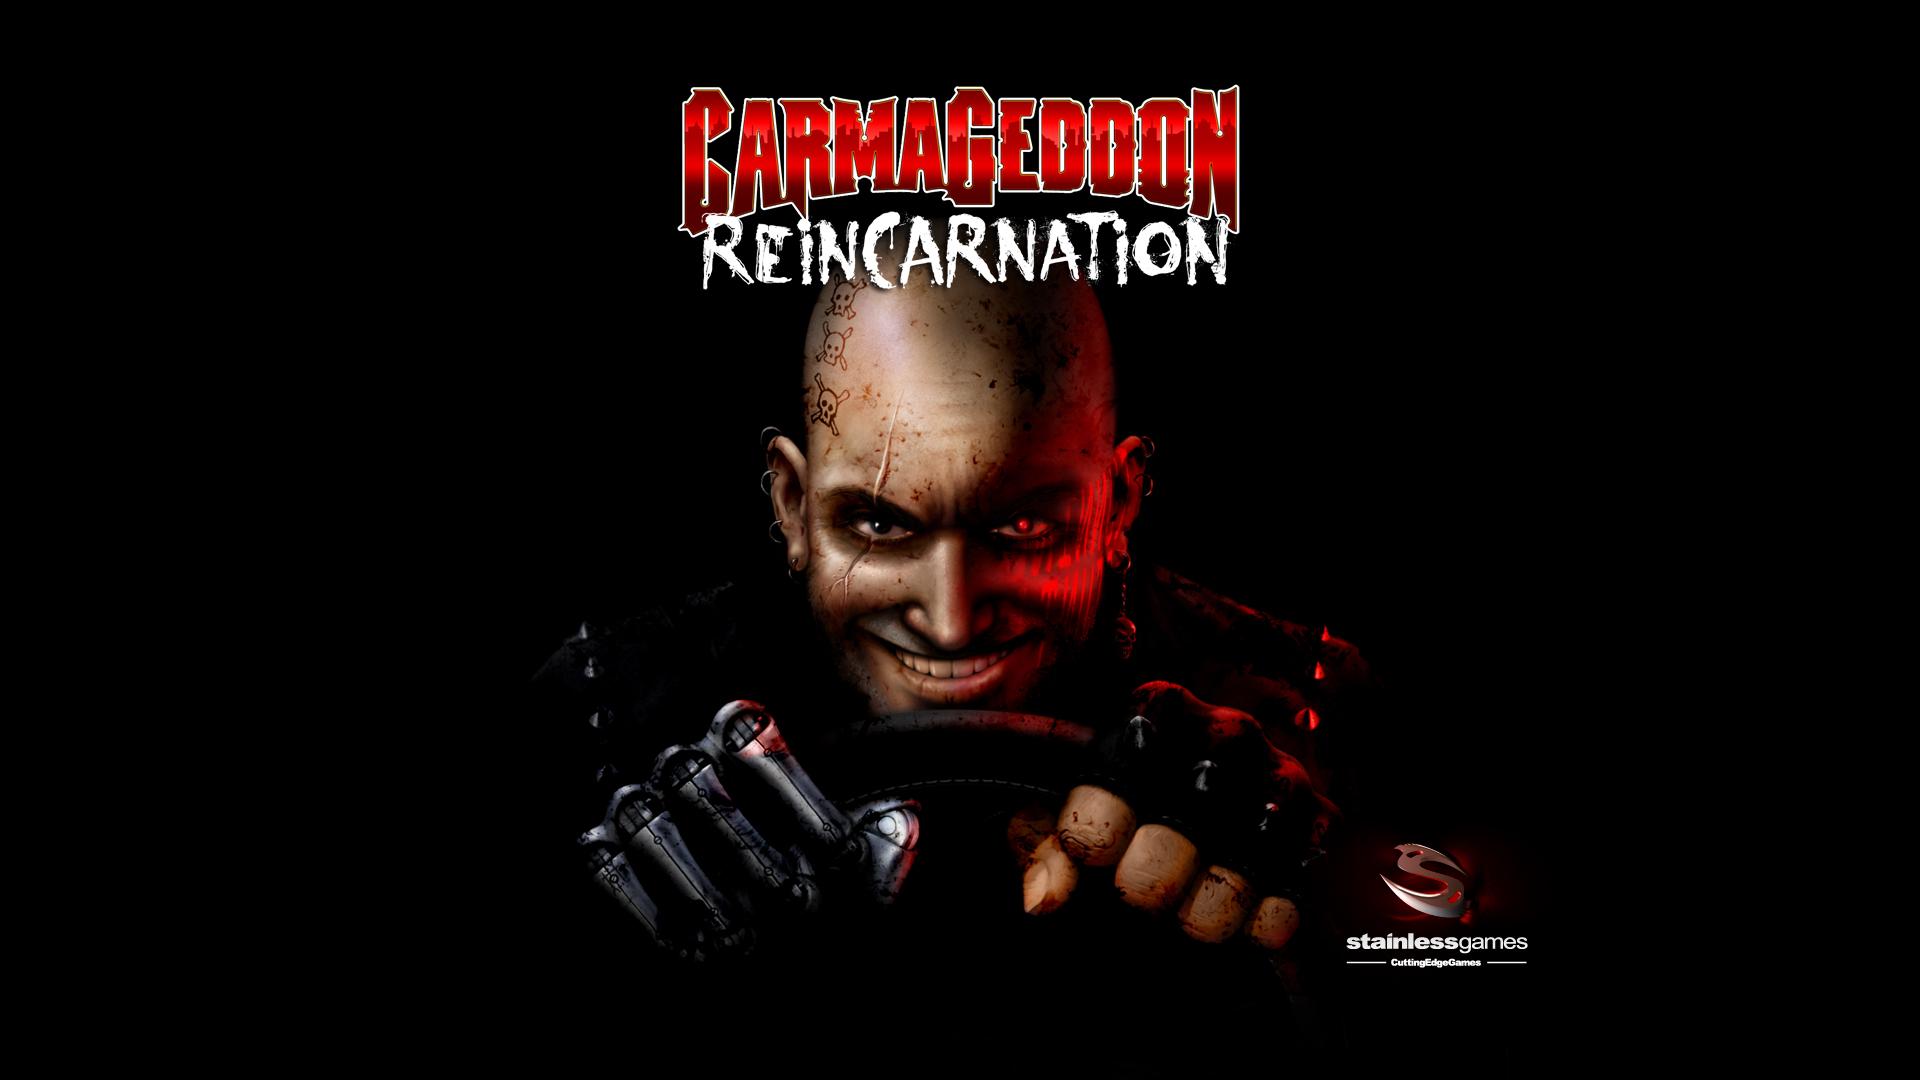 Carmageddon Reincarnation 1920x1080